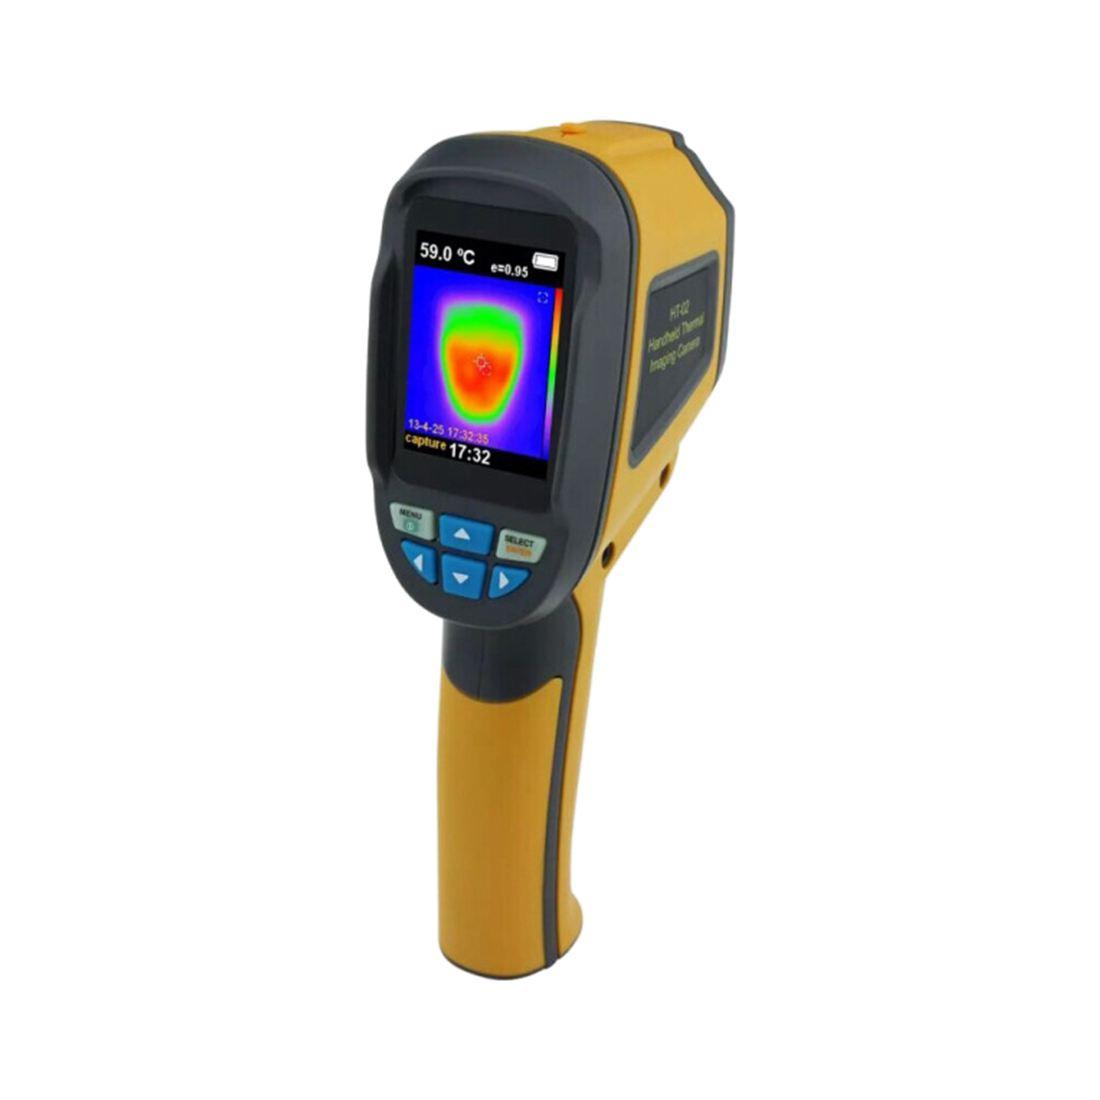 "Thermal Imager (กล้องถ่ายภาพความร้อน) รุ่น HT-02 หน้าจอ 2.4"" TFT 60x60 pixels ราคาไม่แพง"